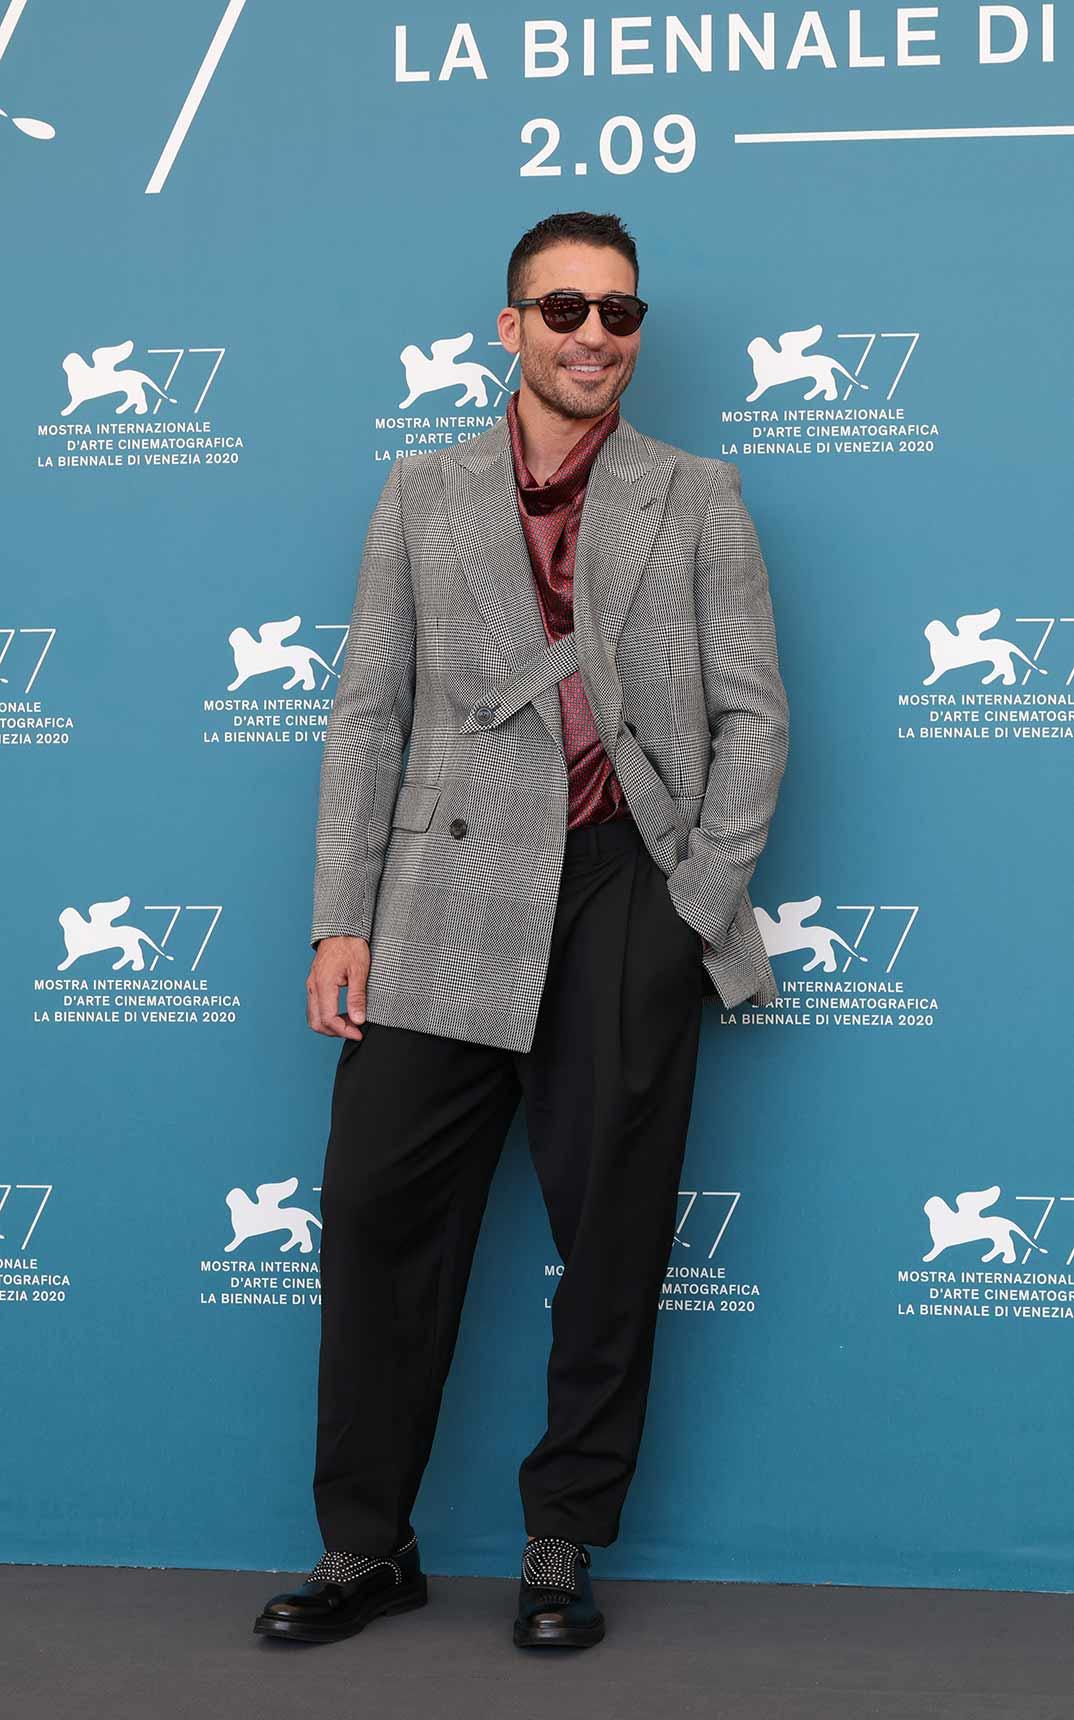 Miguel Angel Silvestre - Festival de Cine de Venecia © Foto ASAC/Andrea Avezz